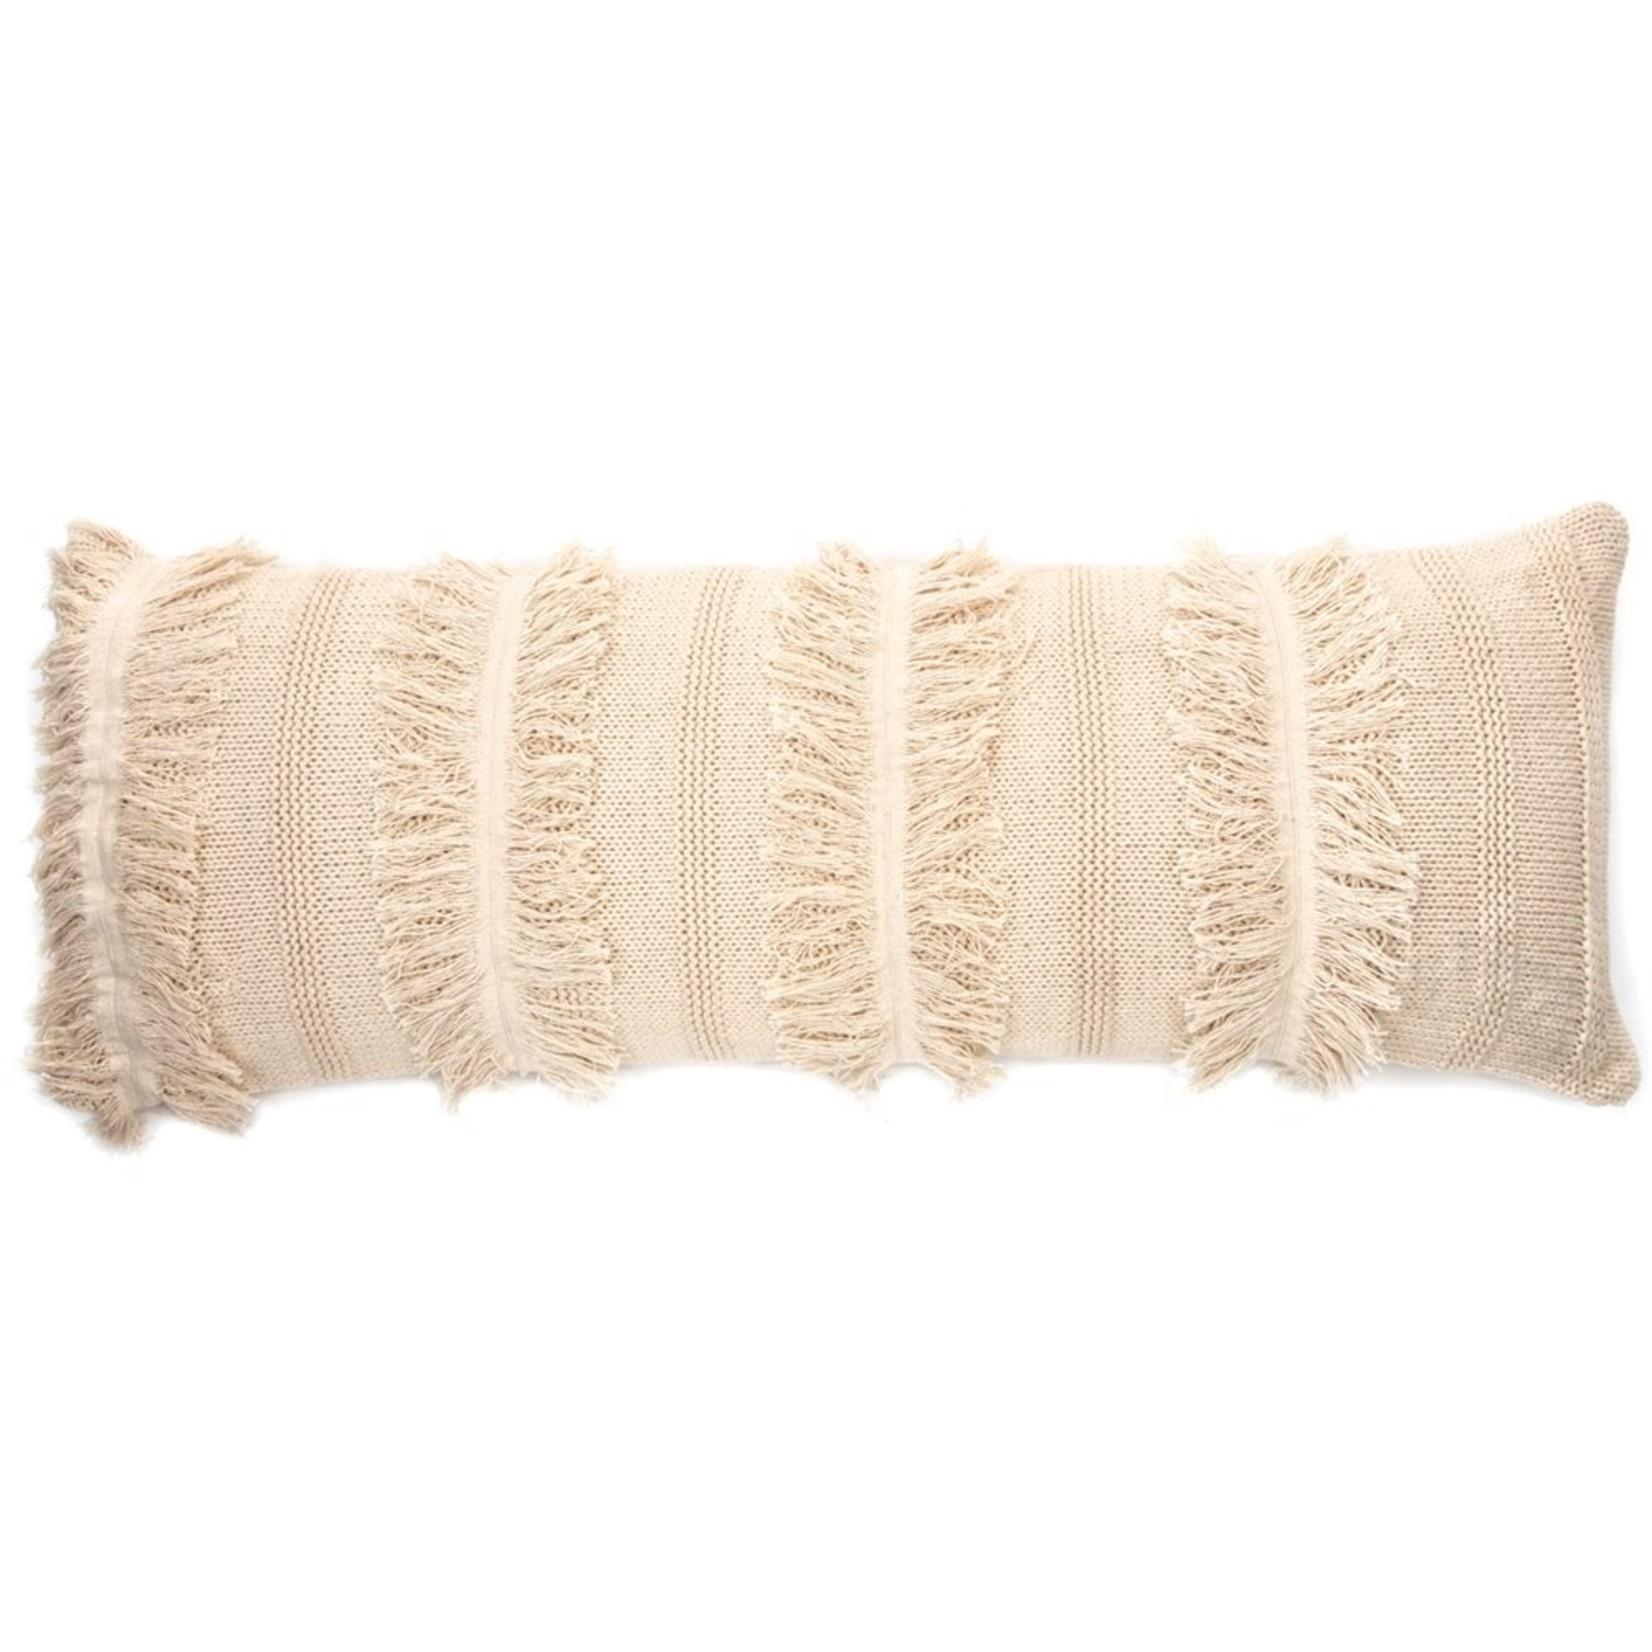 Brunelli Gnocchi Cushion